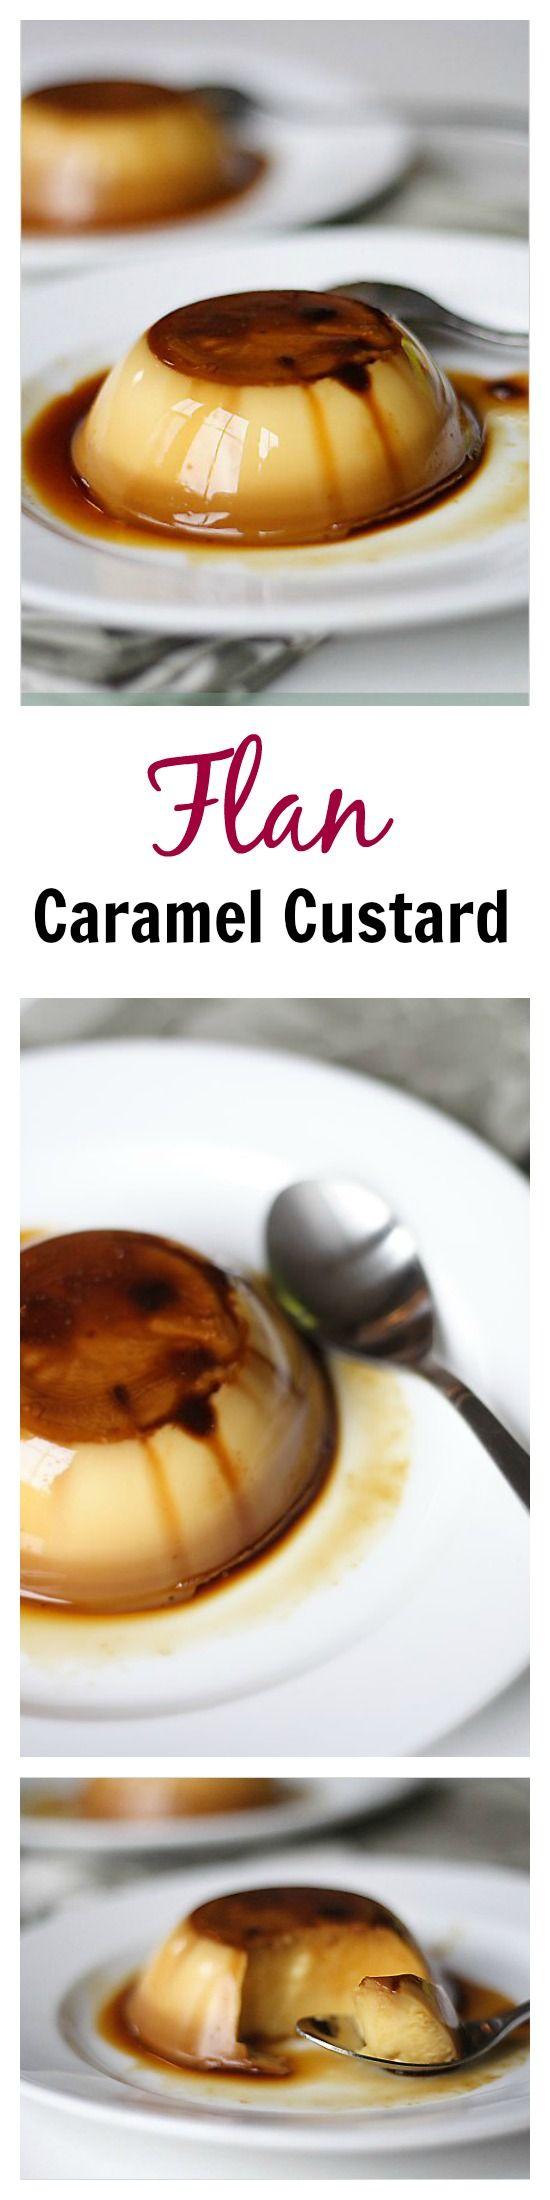 Flan or caramel custard recipe. Easy, sweet, silky smooth egg custard ...